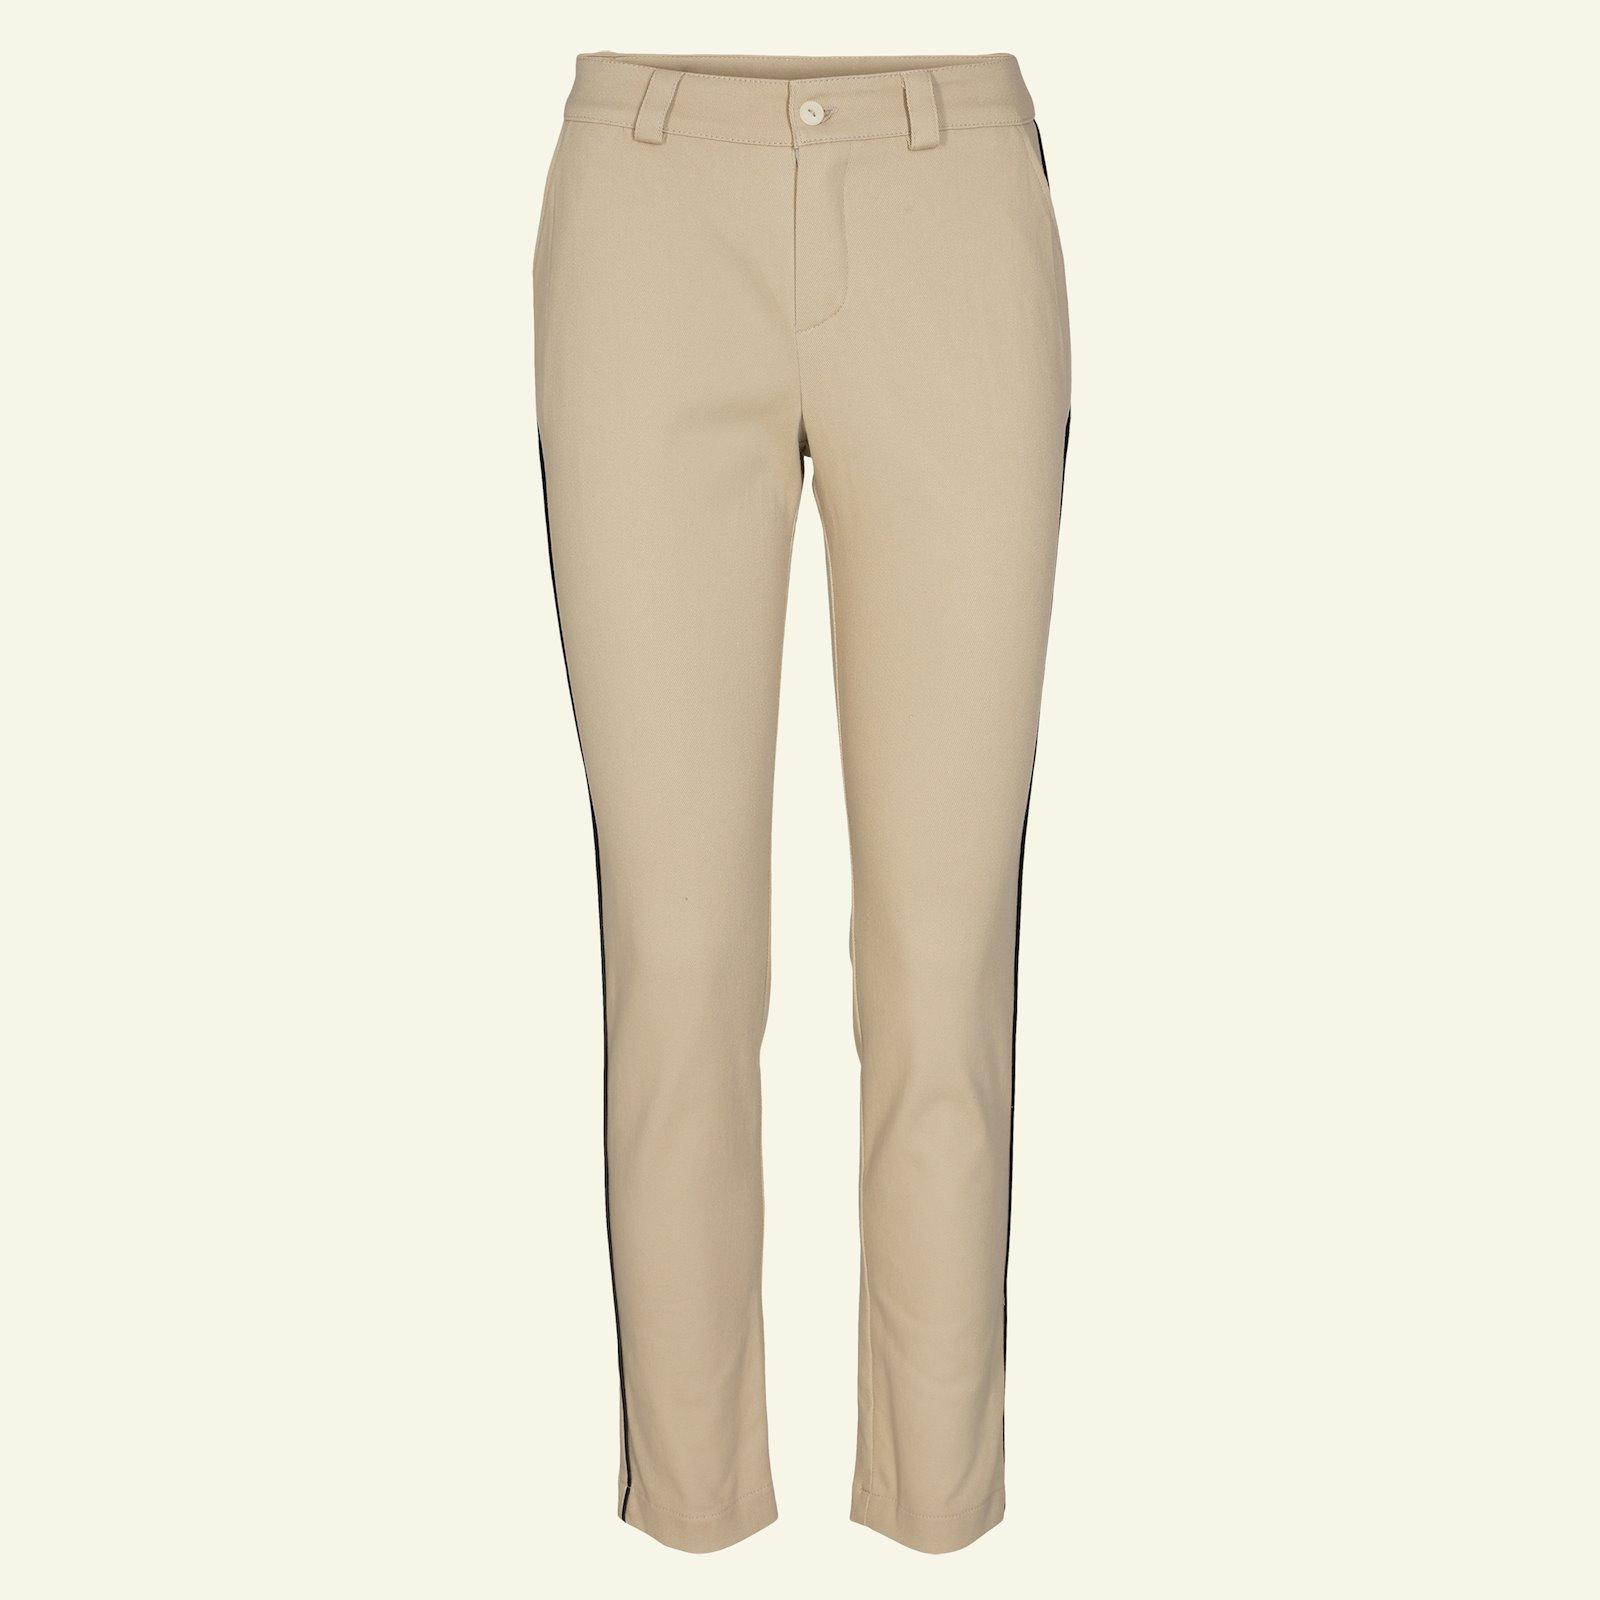 Trousers, 38/10 p20033_460842_72043_sskit